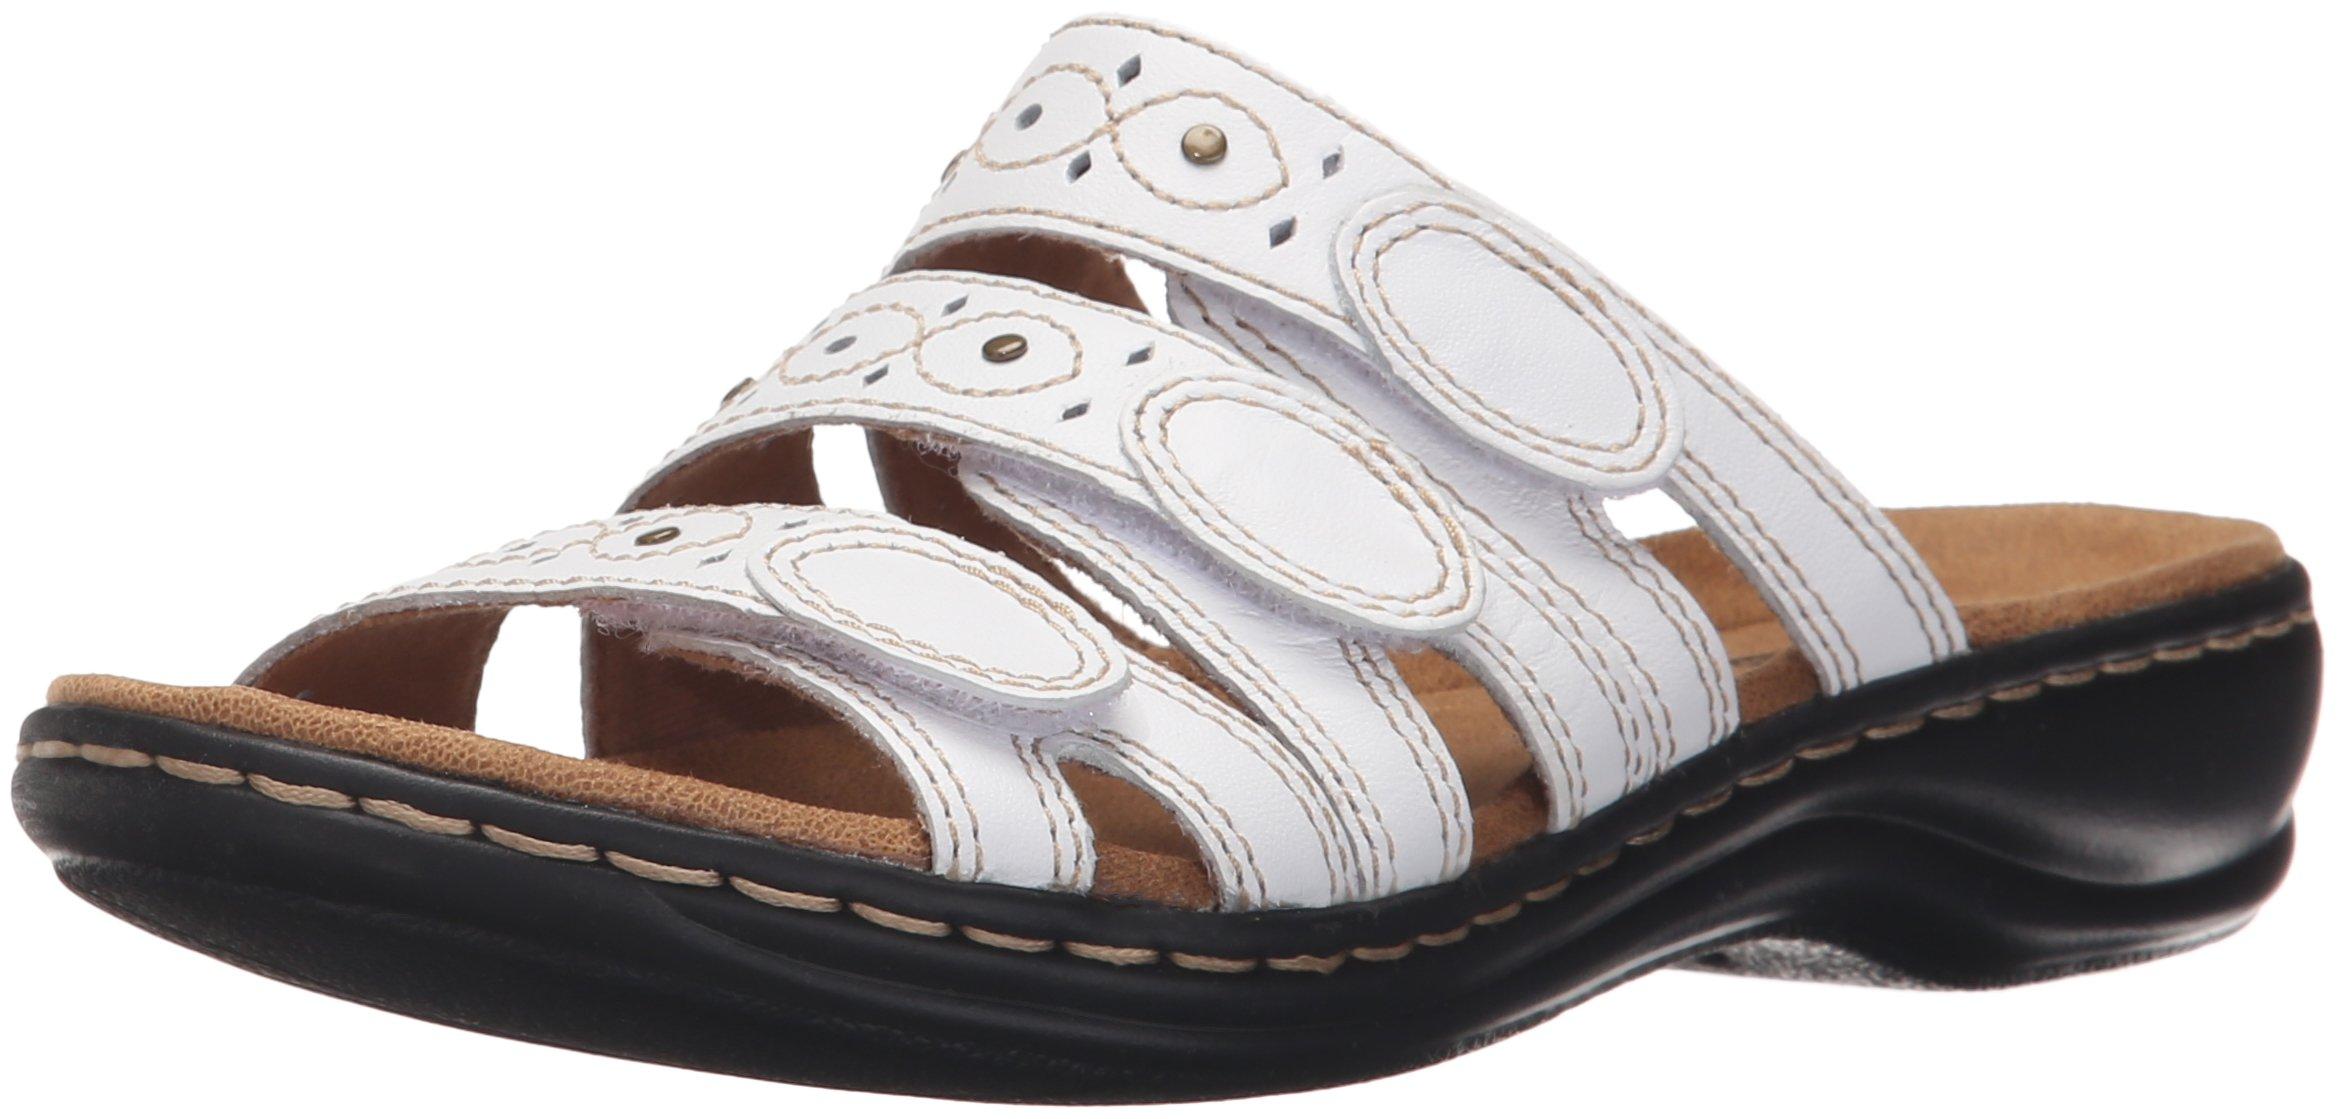 060ecefe25de Get Quotations · CLARKS Women s Leisa Cacti Slide Sandal